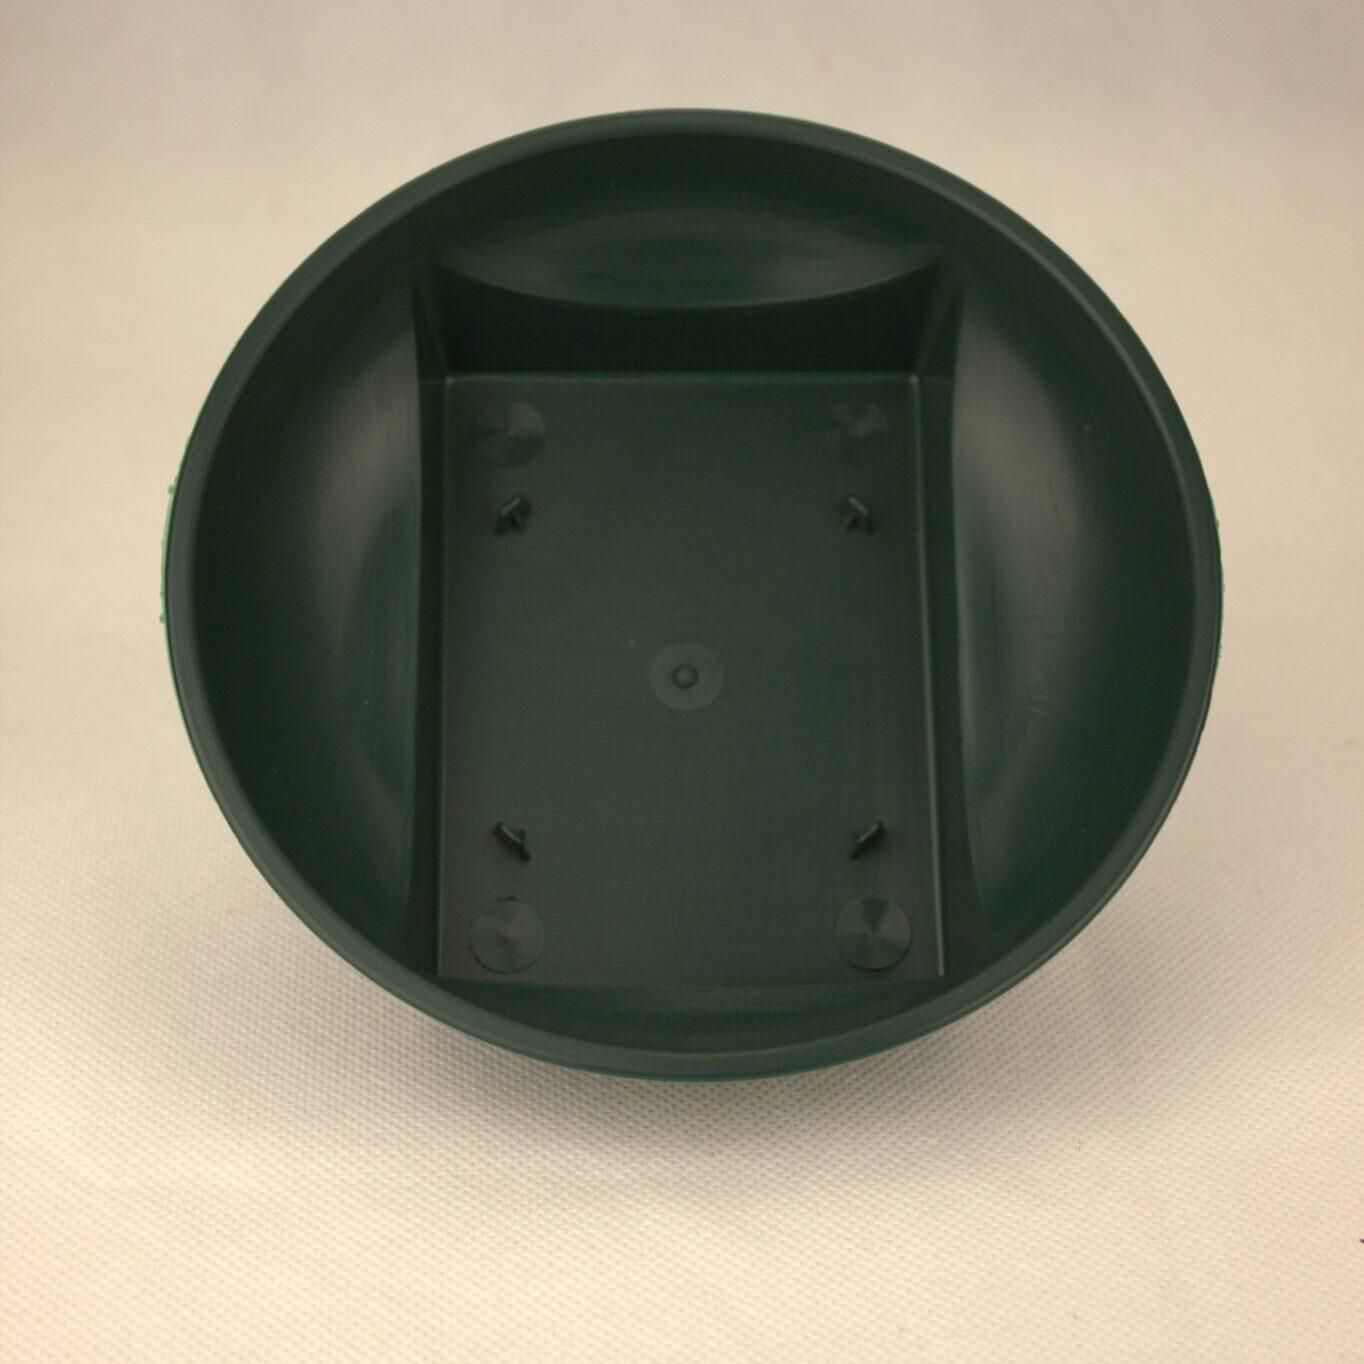 Square round dish 0099